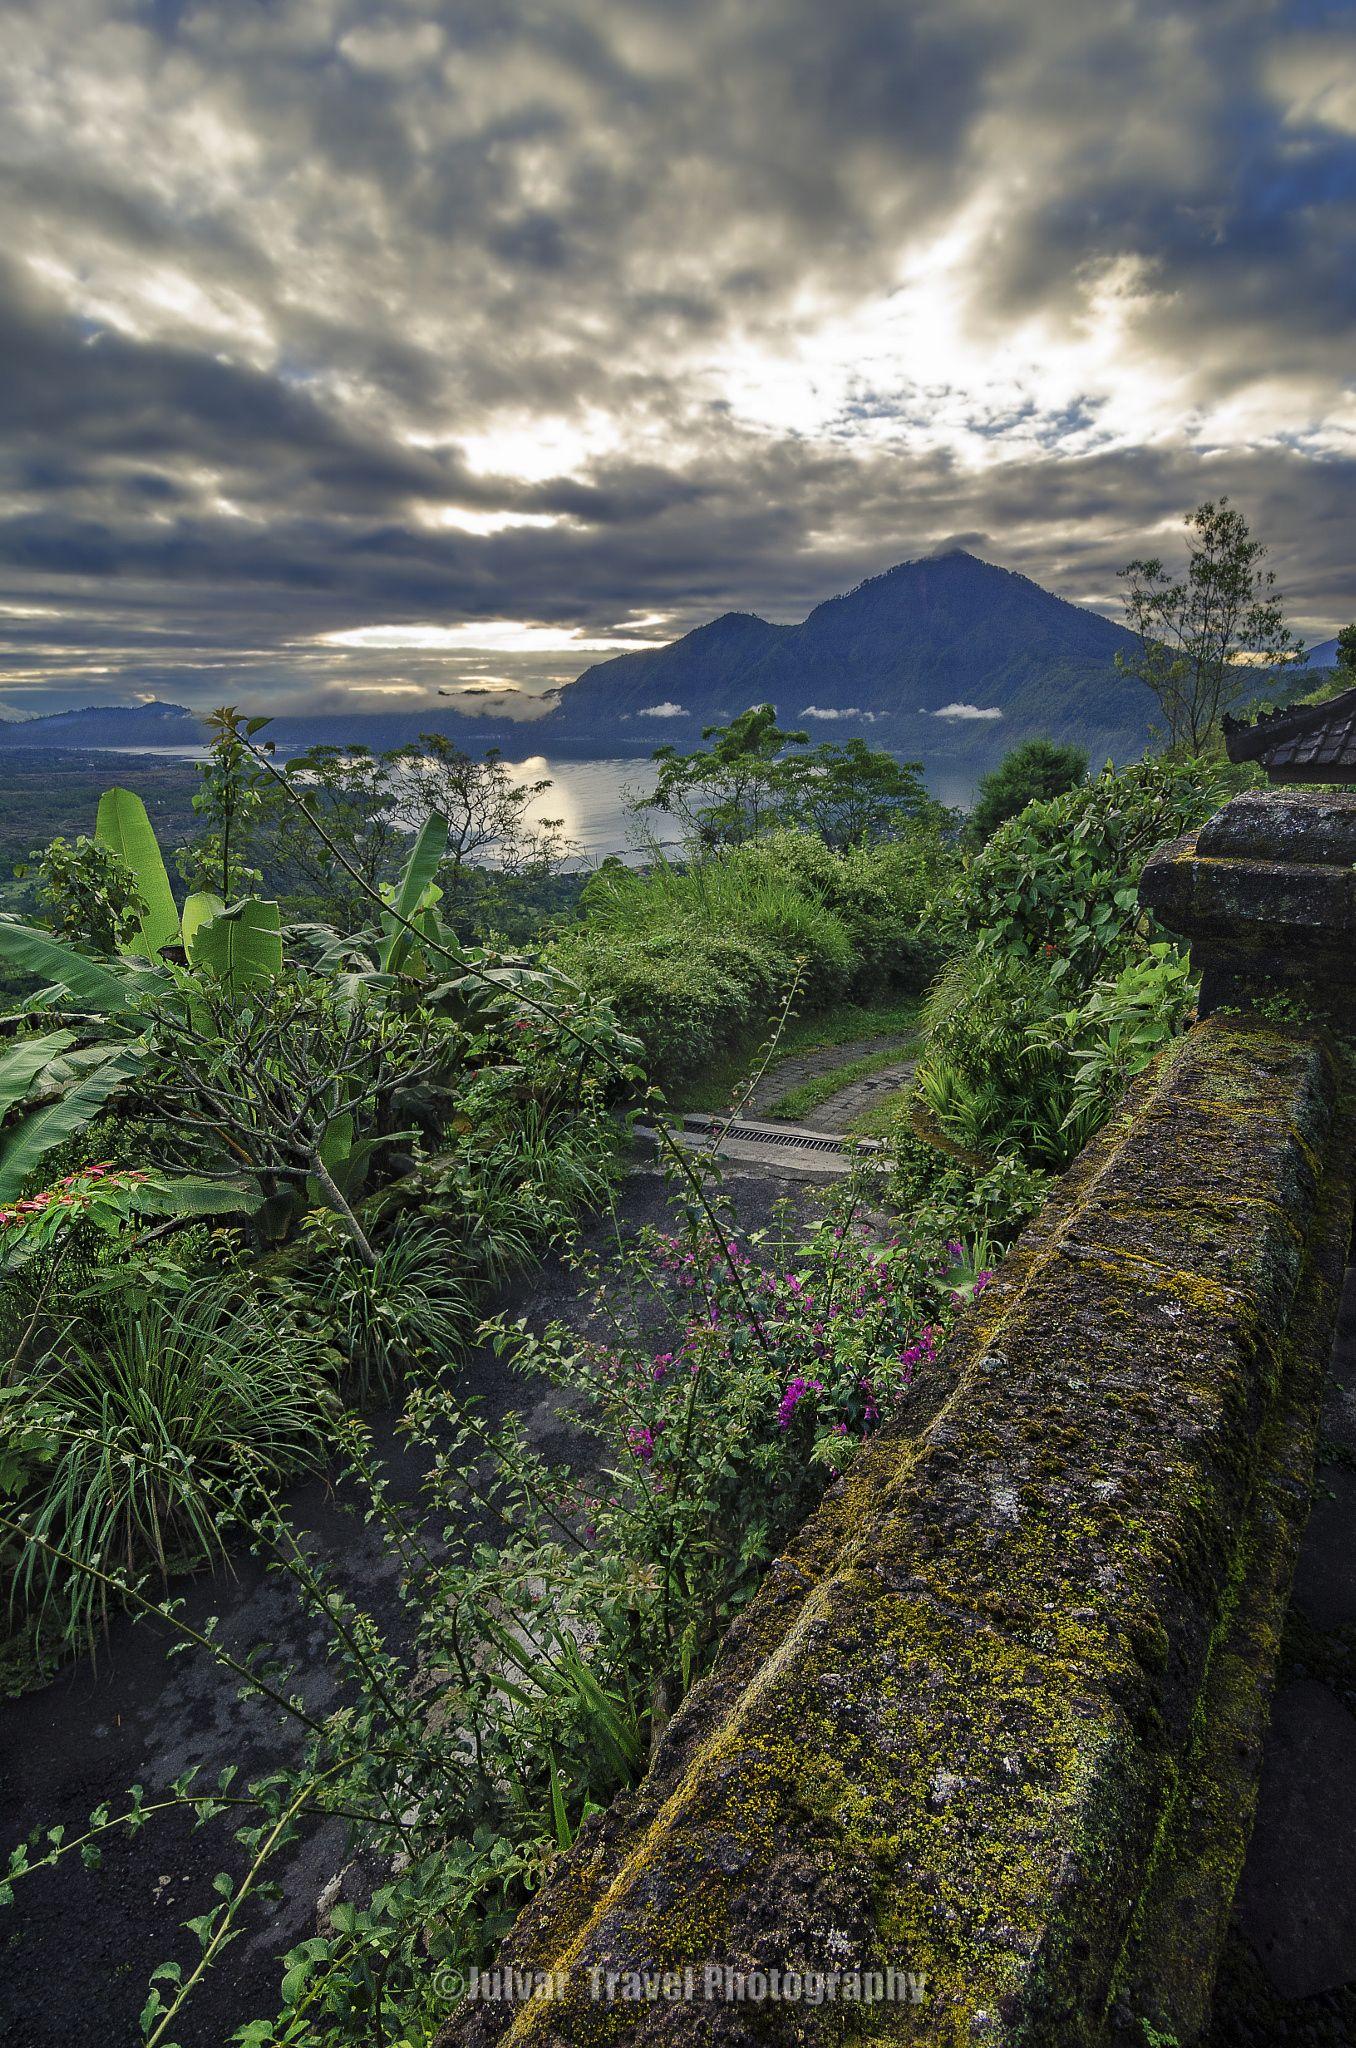 Sunrise over Kintamani Bali, Indonesia by Julvar